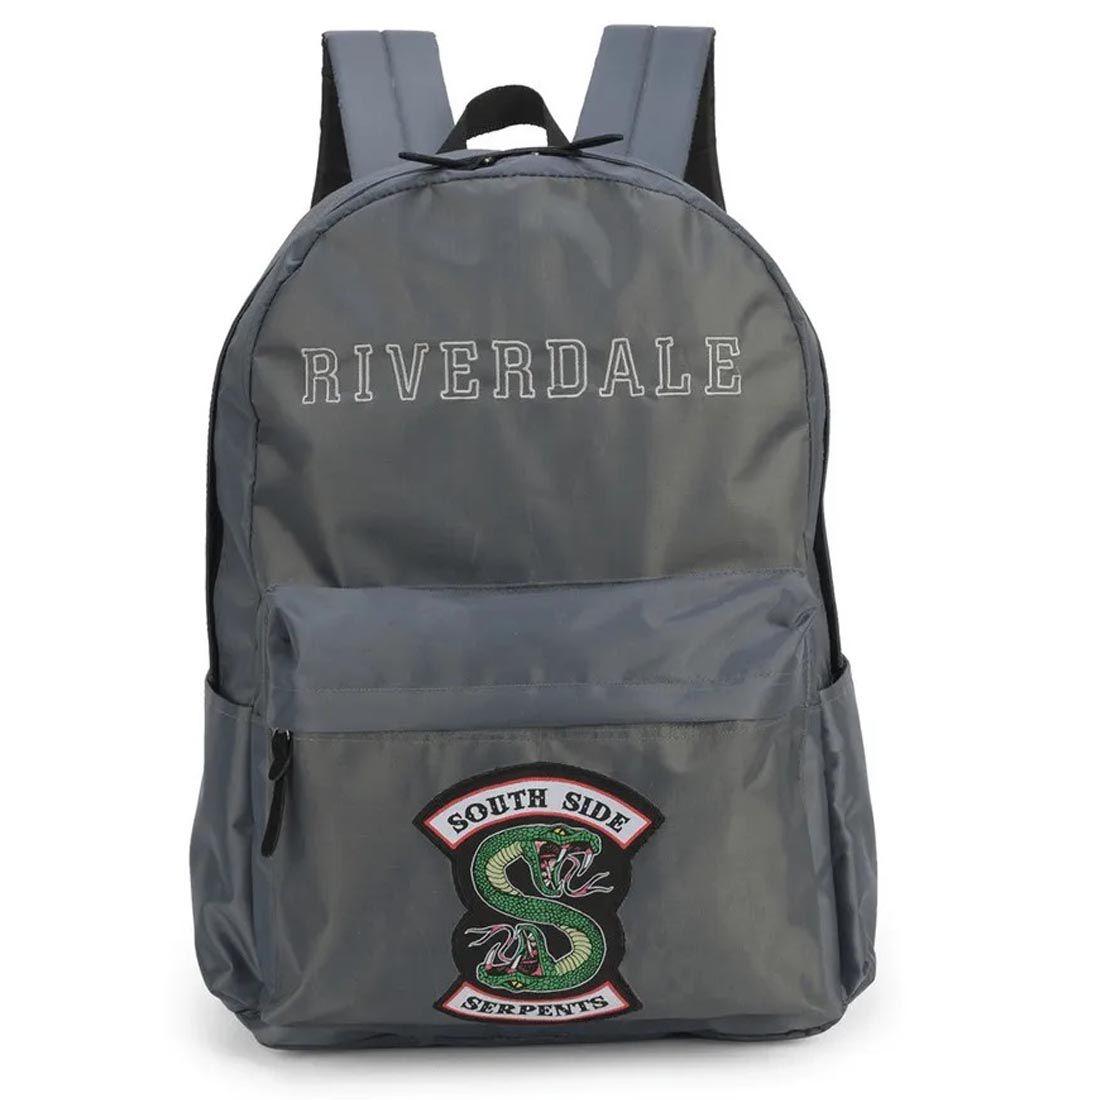 Mochila Para Notebook Riverdale South Side Serpents